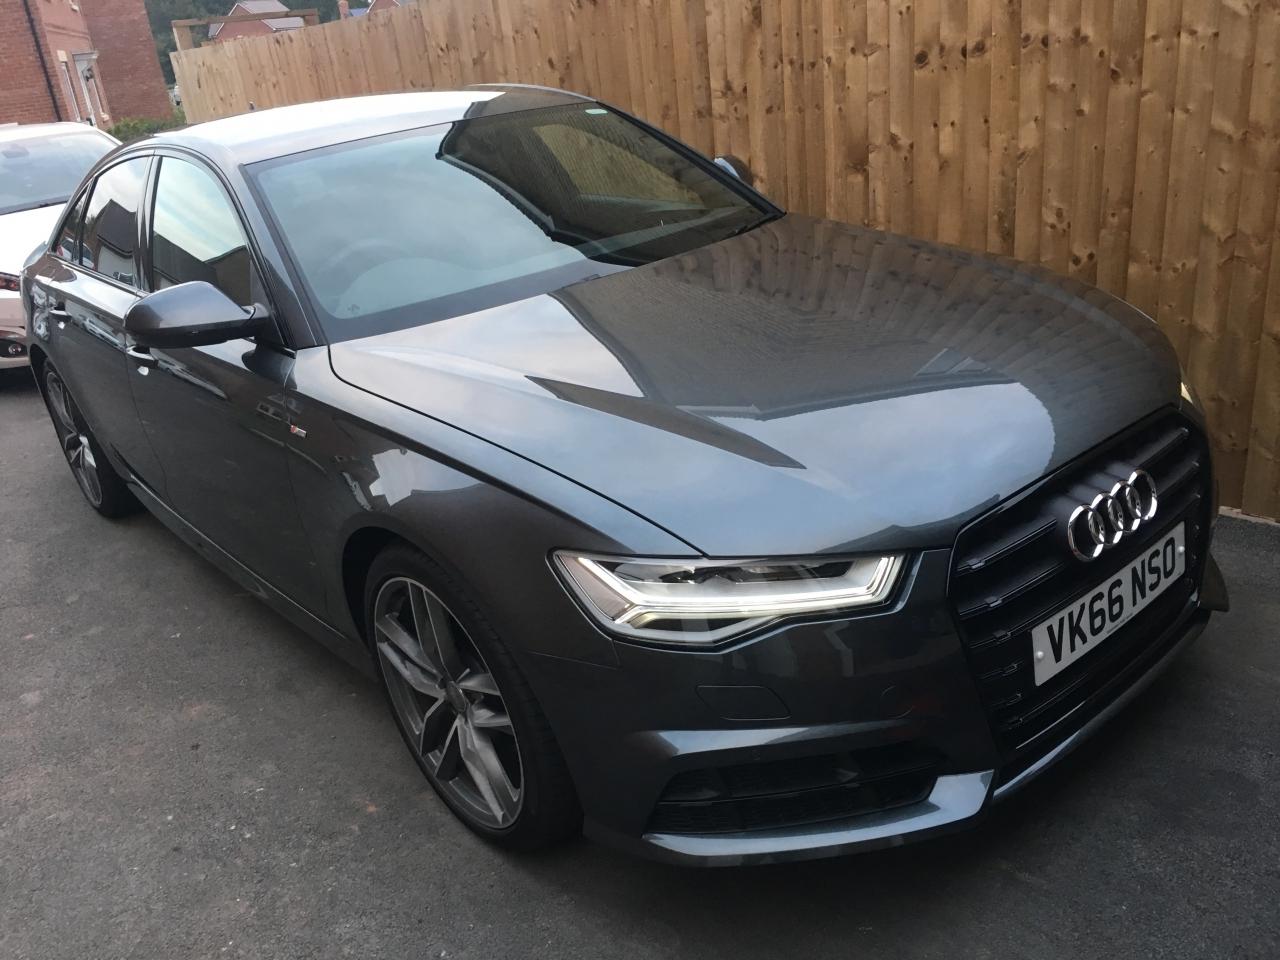 Audi A6 C6 Vcds Mods